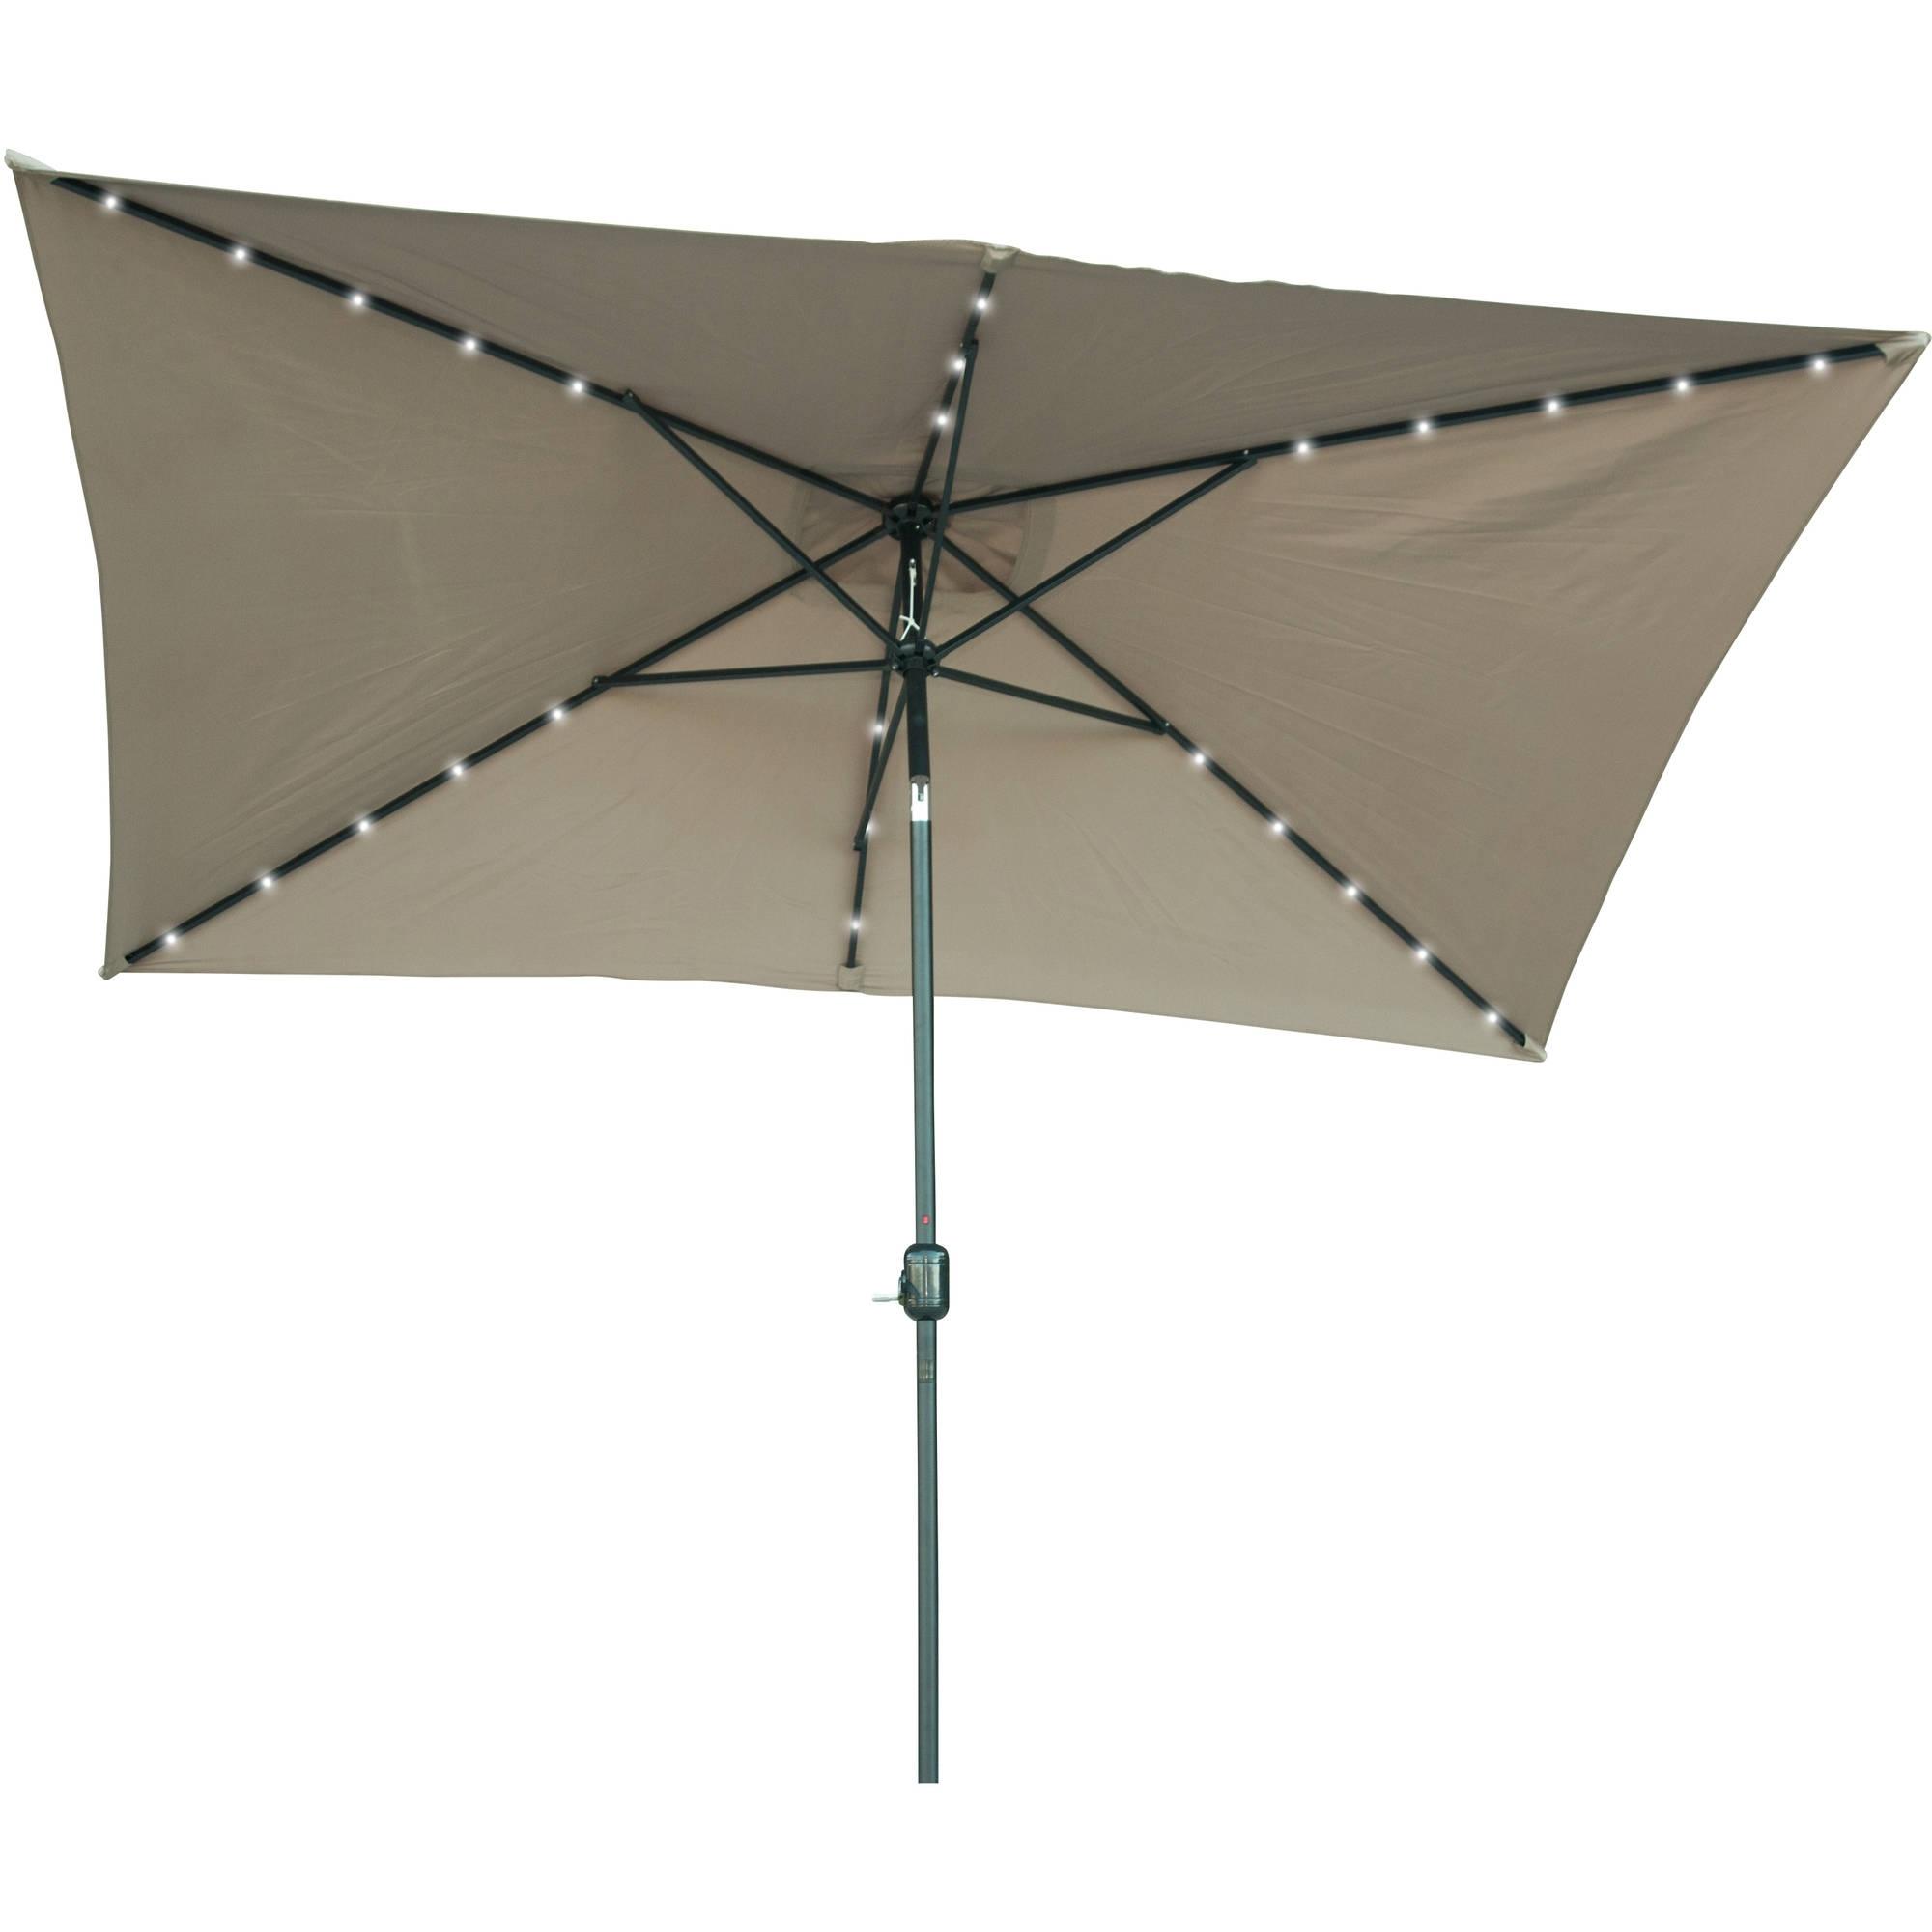 Rectangular Solar Powered Led Lighted Patio Umbrella – 10' X 6.5 Regarding Well Known Patio Umbrellas With Lights (Gallery 13 of 20)